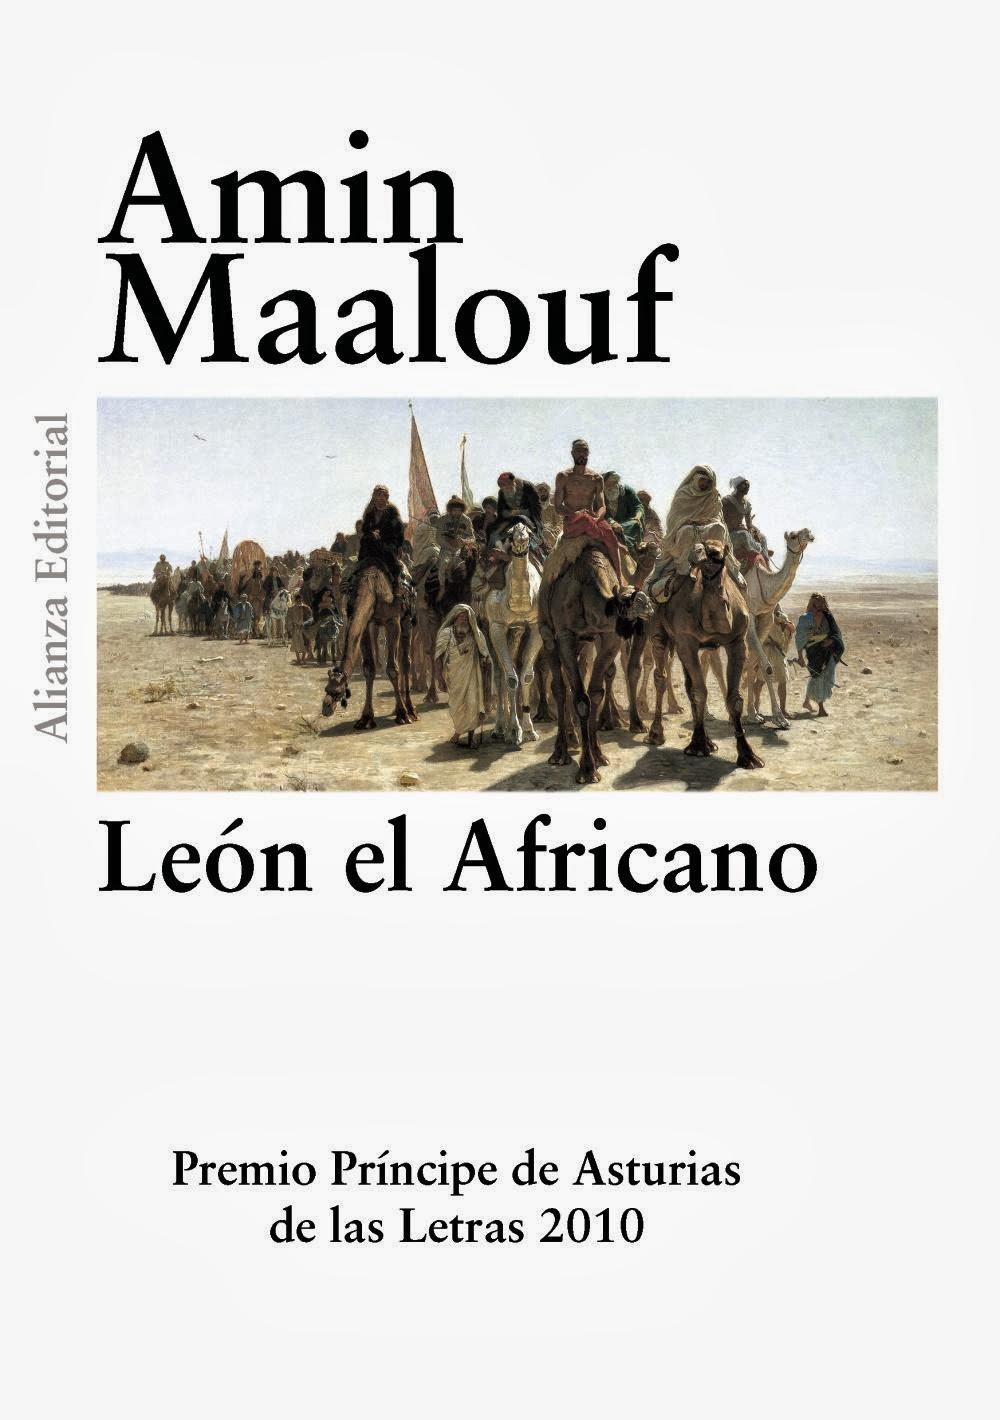 https://laantiguabiblos.blogspot.com.es/2013/10/leon-el-africano-amin-maalouf.html